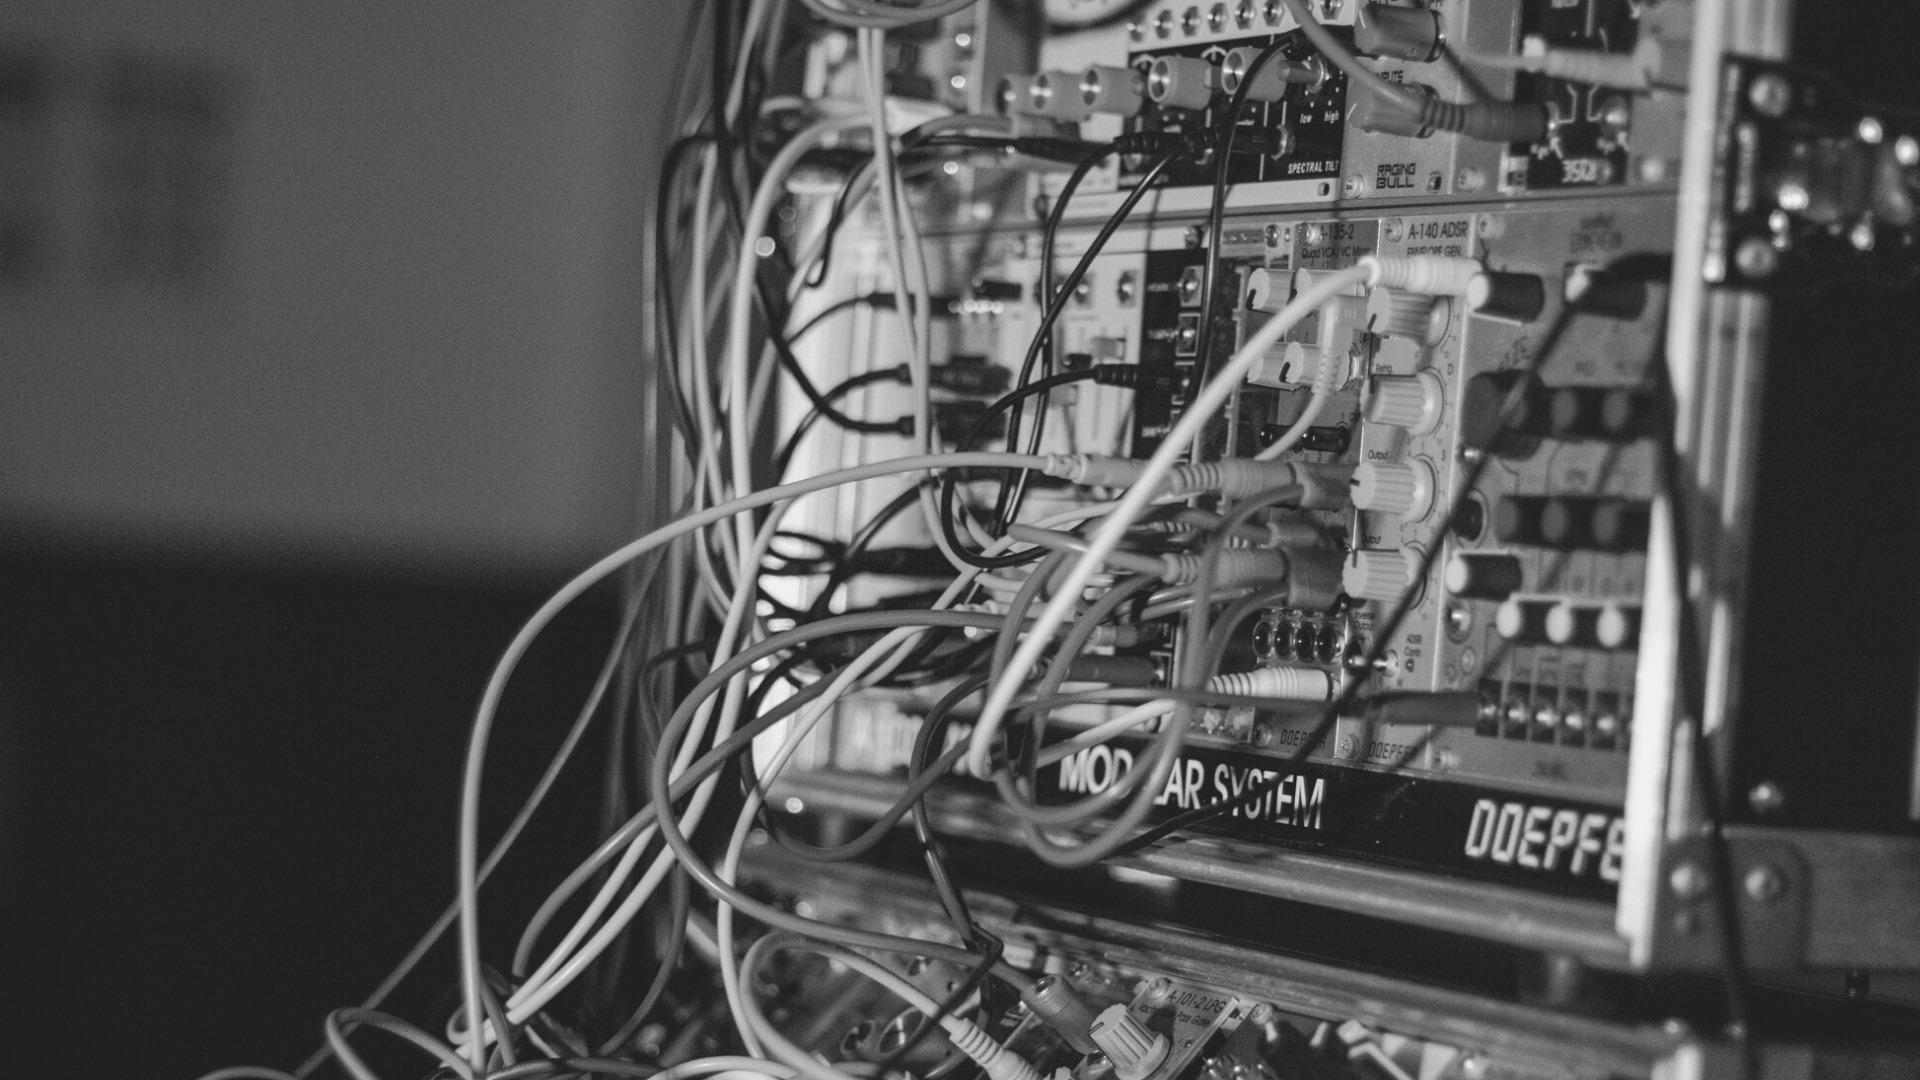 BMA lab: Pedro Augusto - Síntese Sonora / Introdução aos Sintetizadores